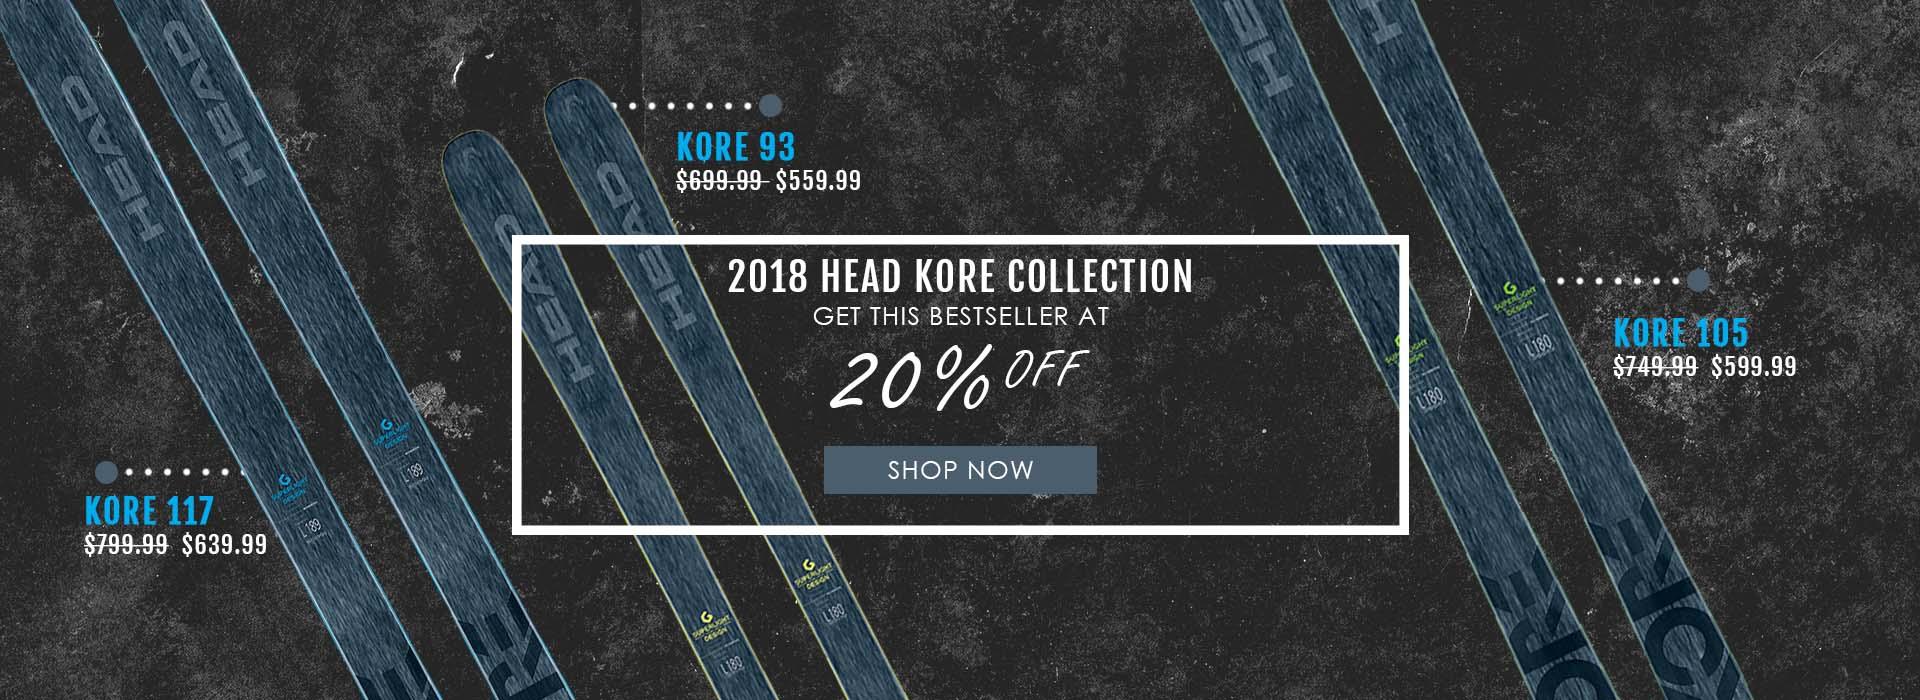 2018_Head_Kore_Sale